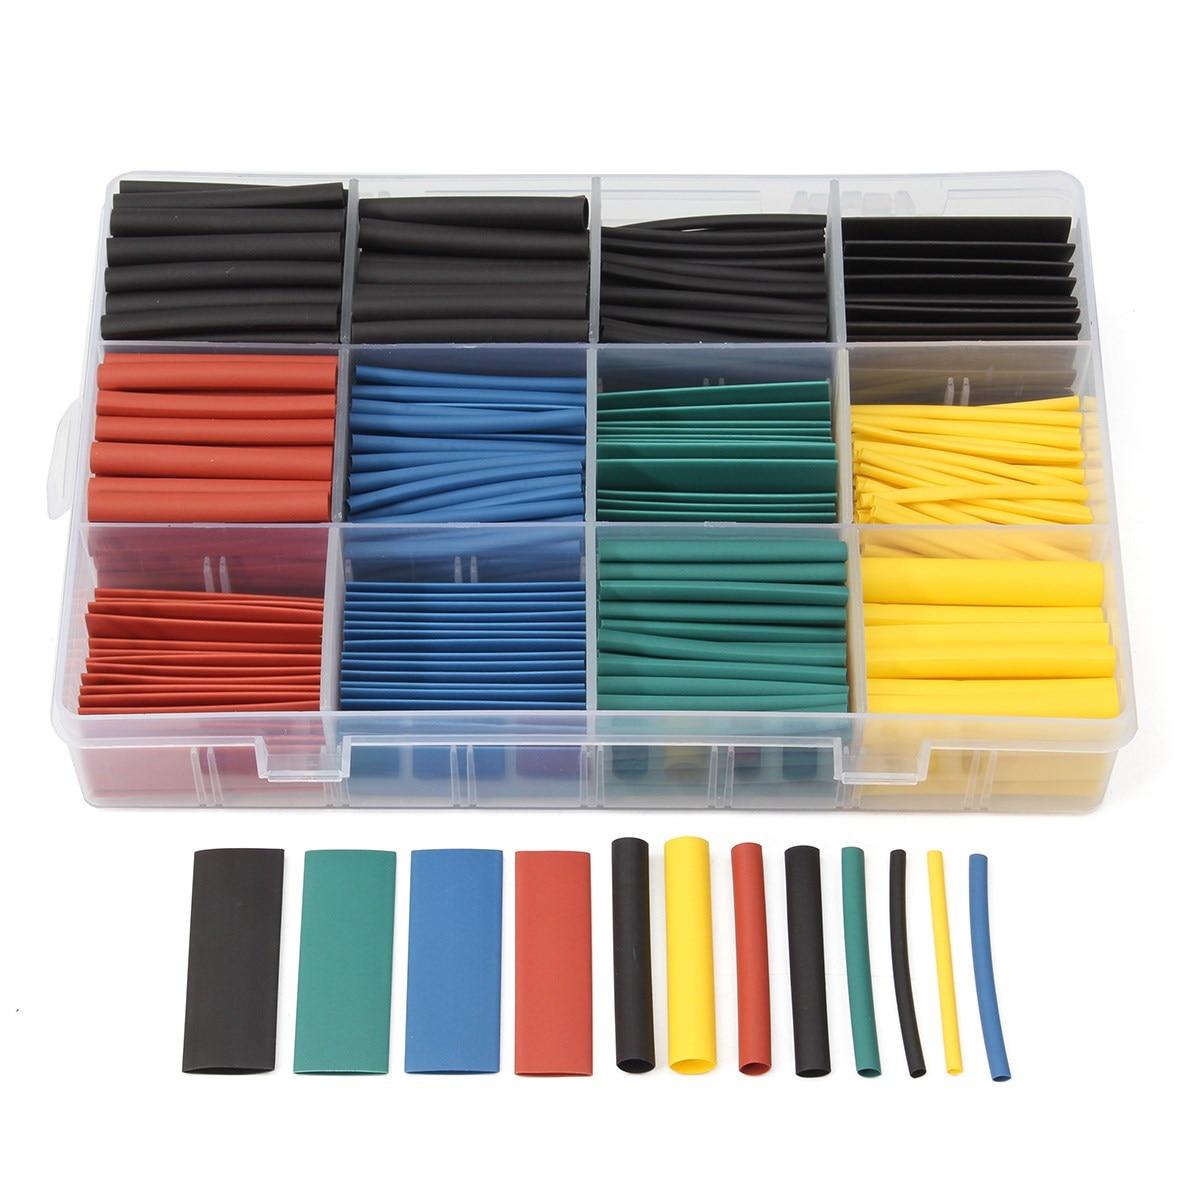 530pcs Multi Color Heat Shrink Tubing Insulation Shrinkable Tube Assortment Electronic Polyolefin Ratio 2:1 Wrap Sleeve Tube Kit